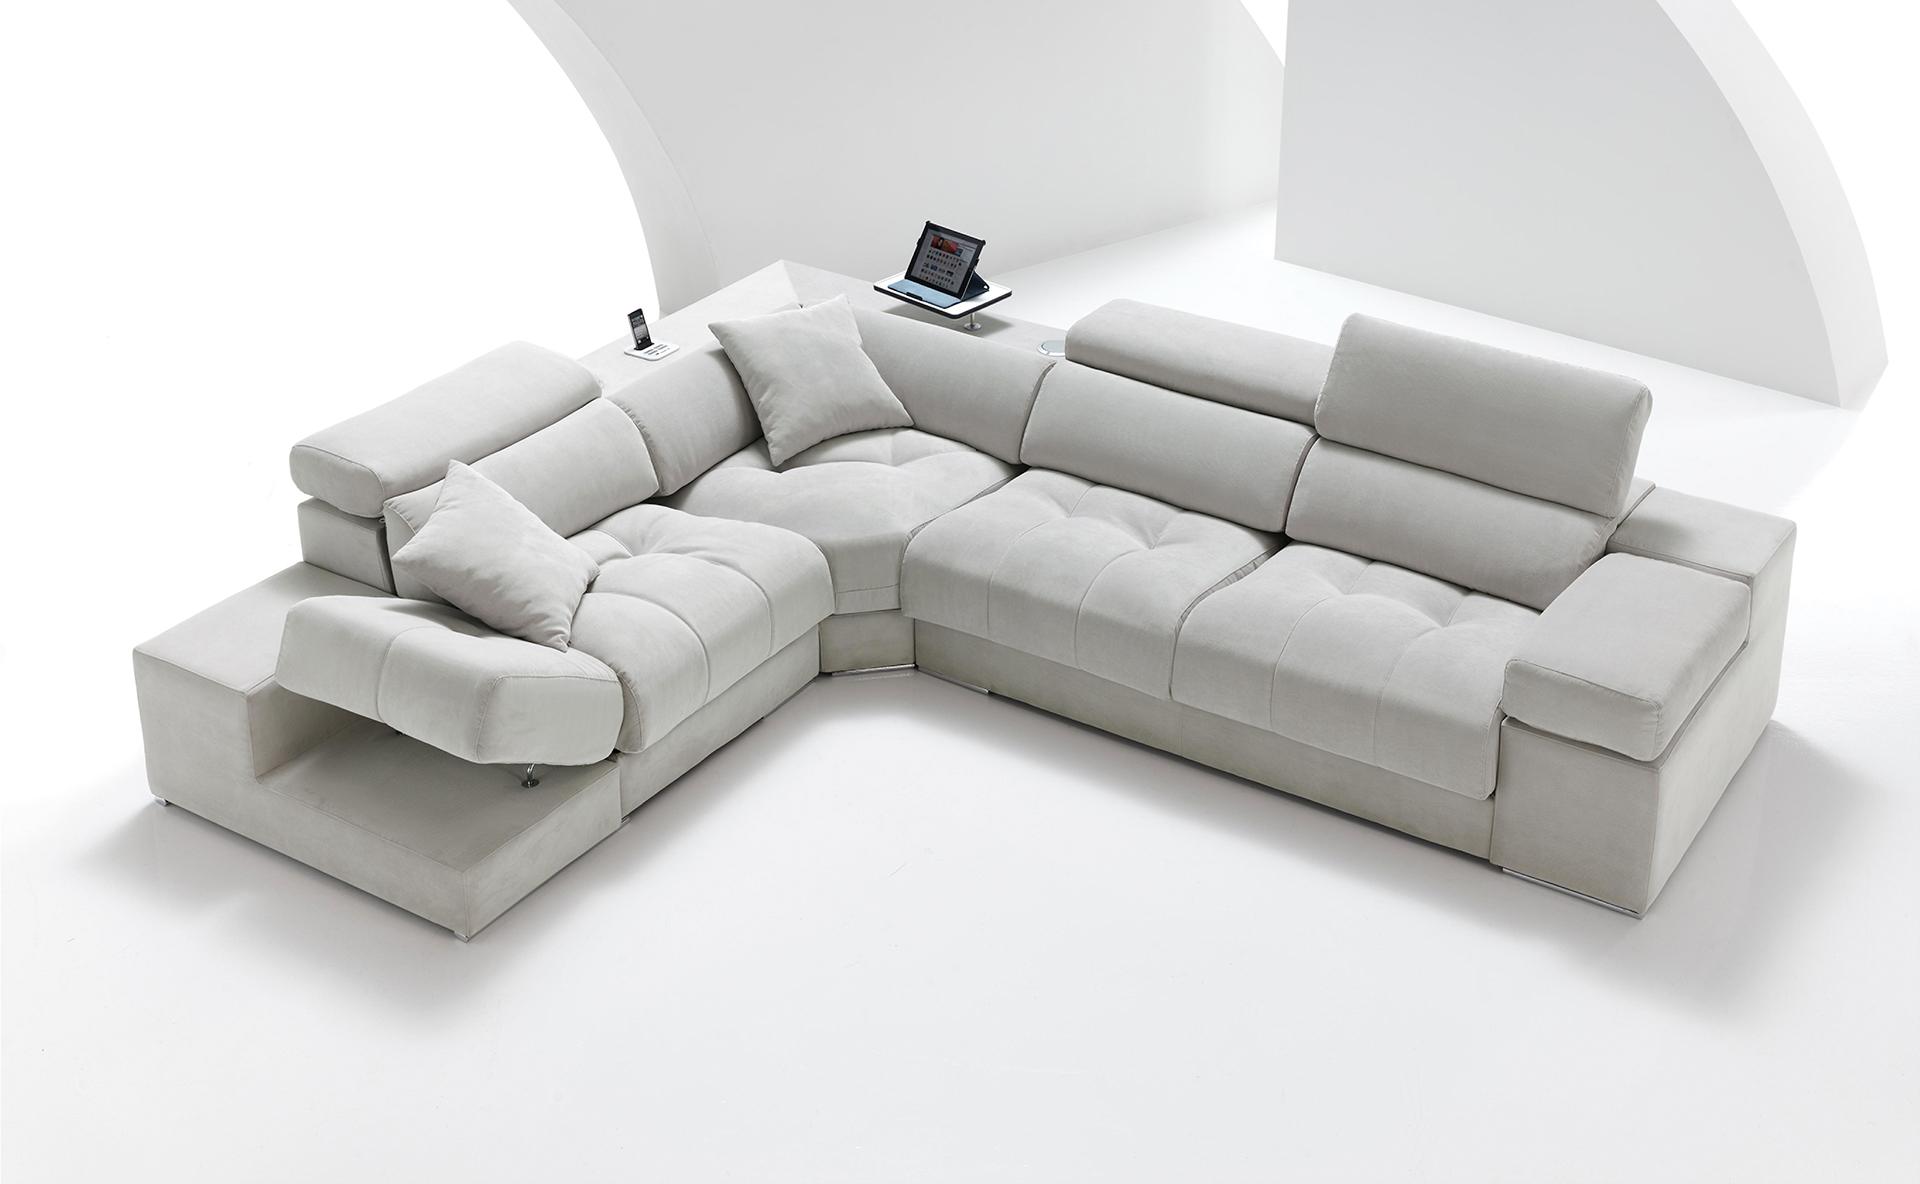 sofás tapizados en tela o piel